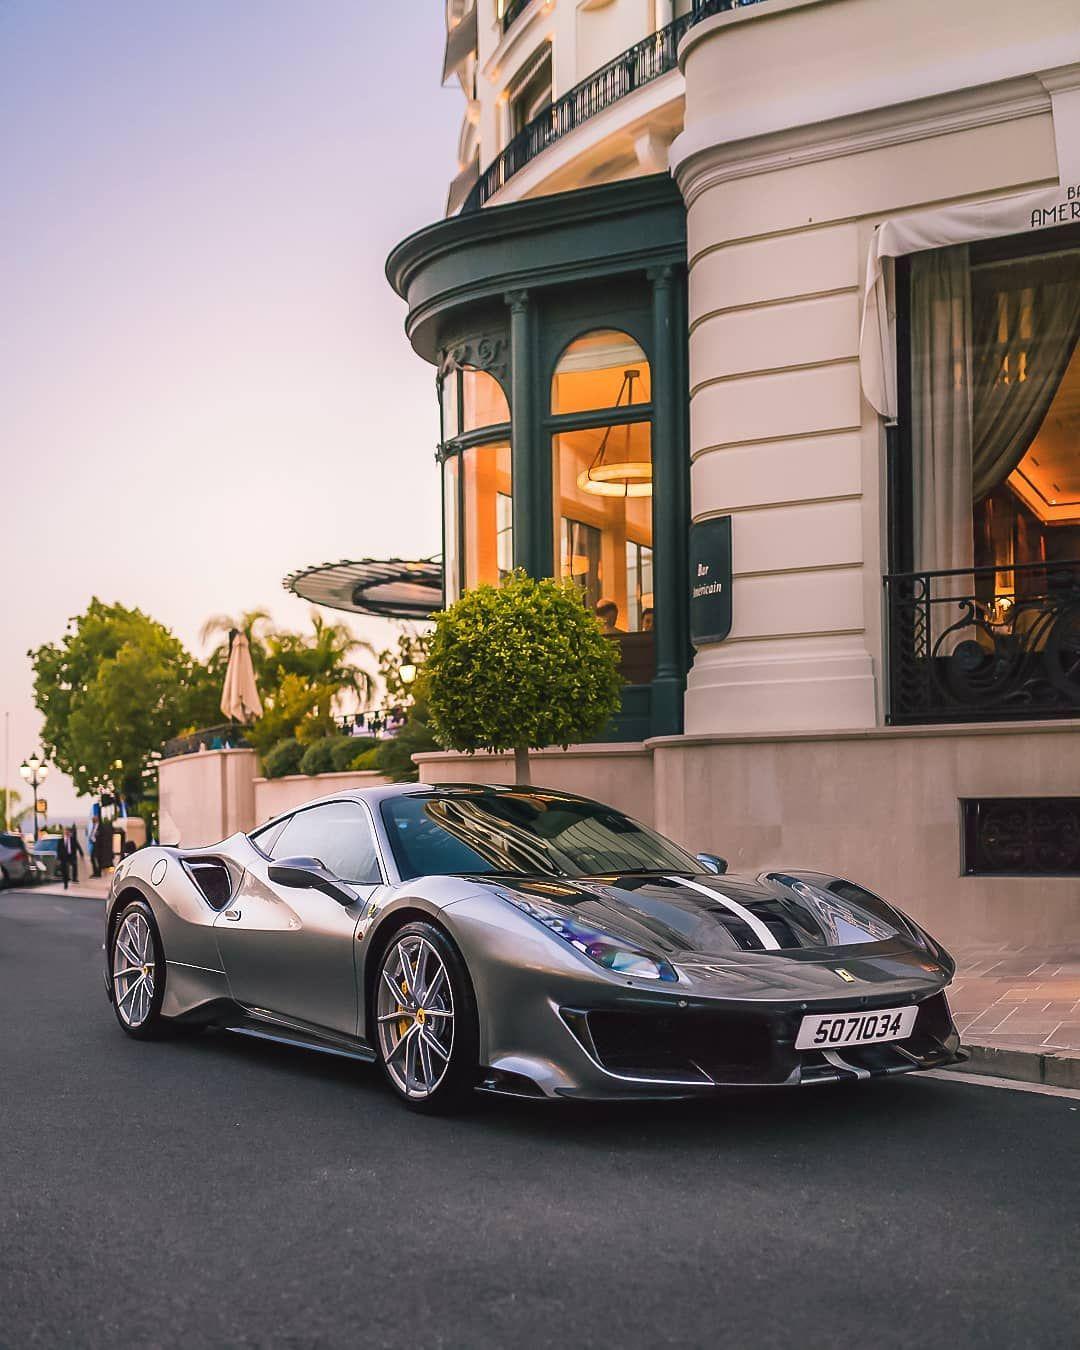 Monaco Monako On Instagram Italian Car At The American Bar Pista With Images Car Italian Cars Ferrari